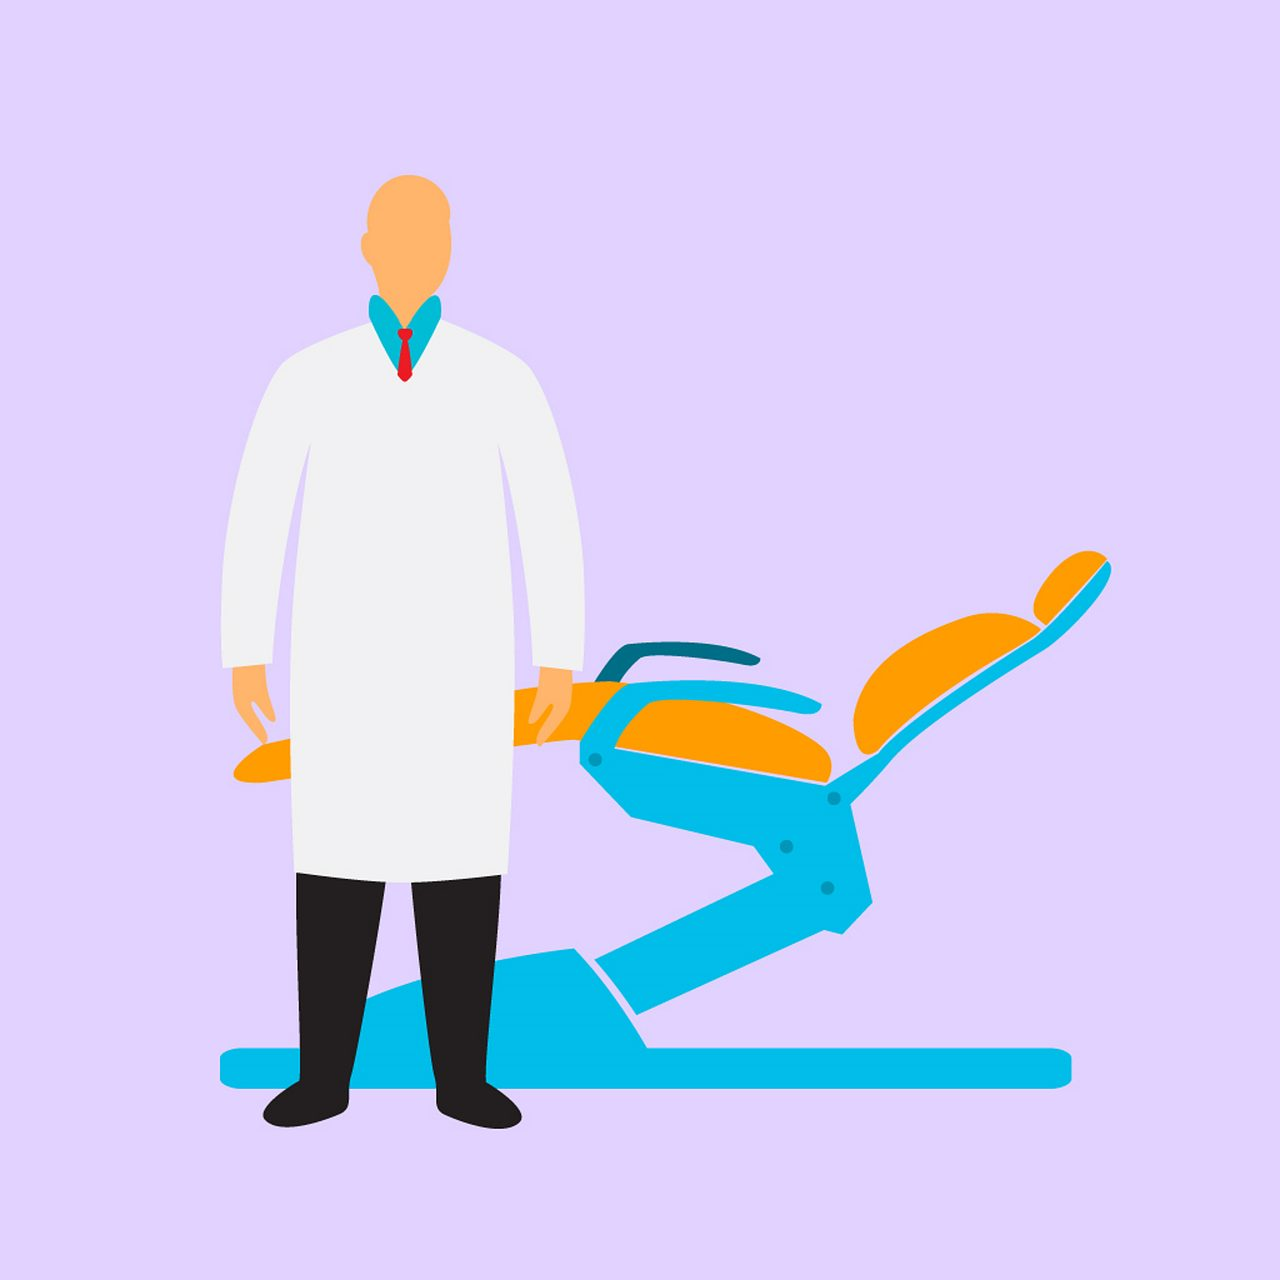 Donk-Schouten A A M tandartsen